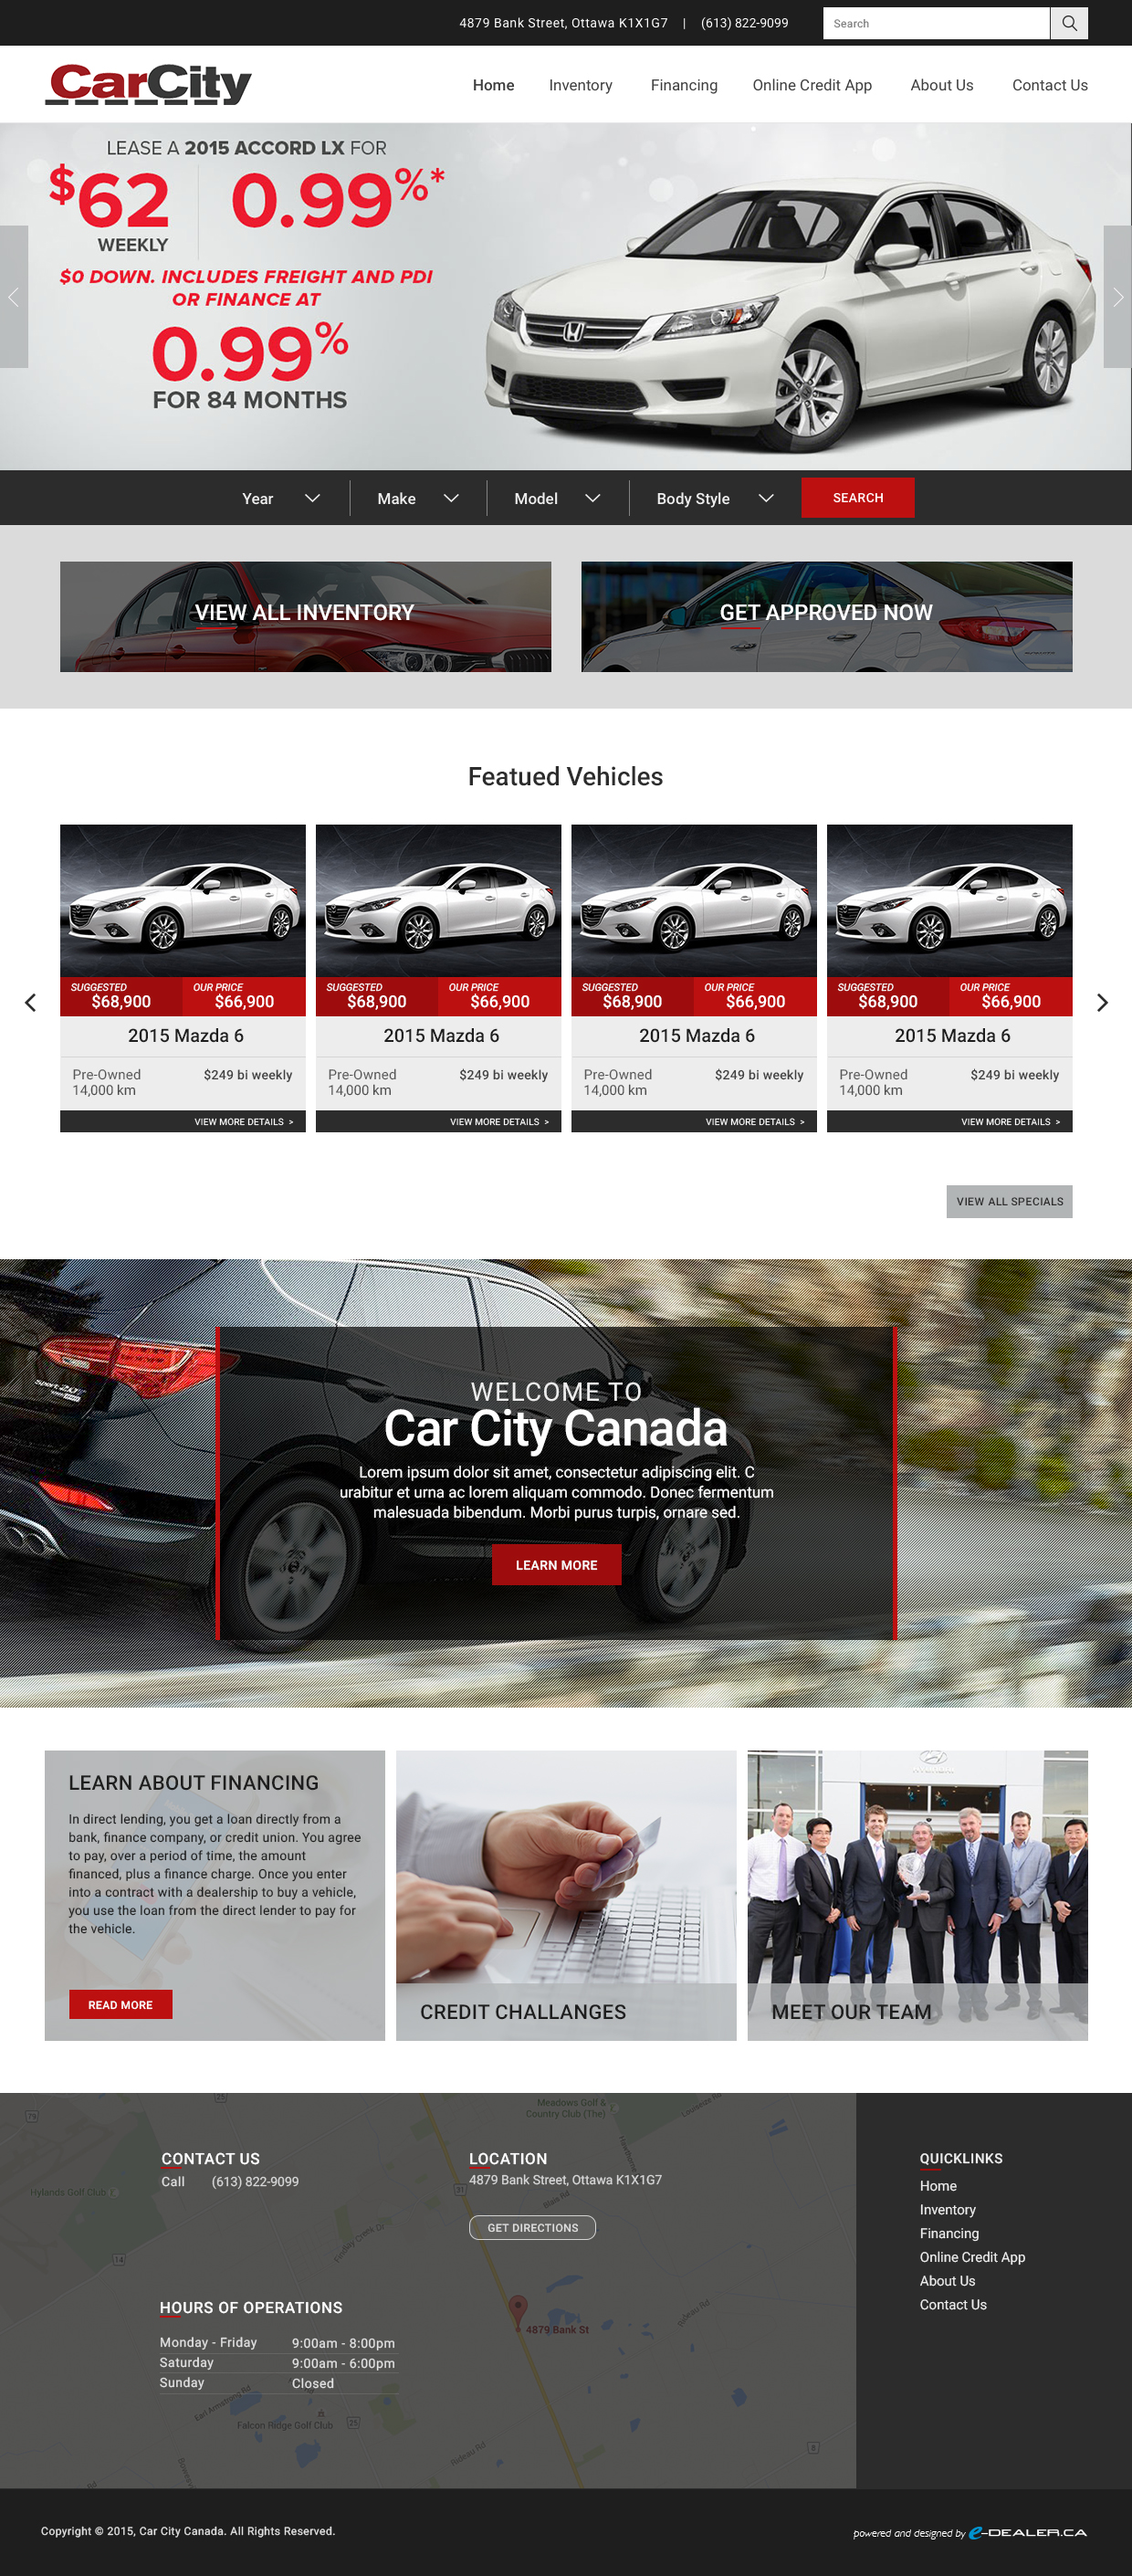 CarCityCanada-Design-Final